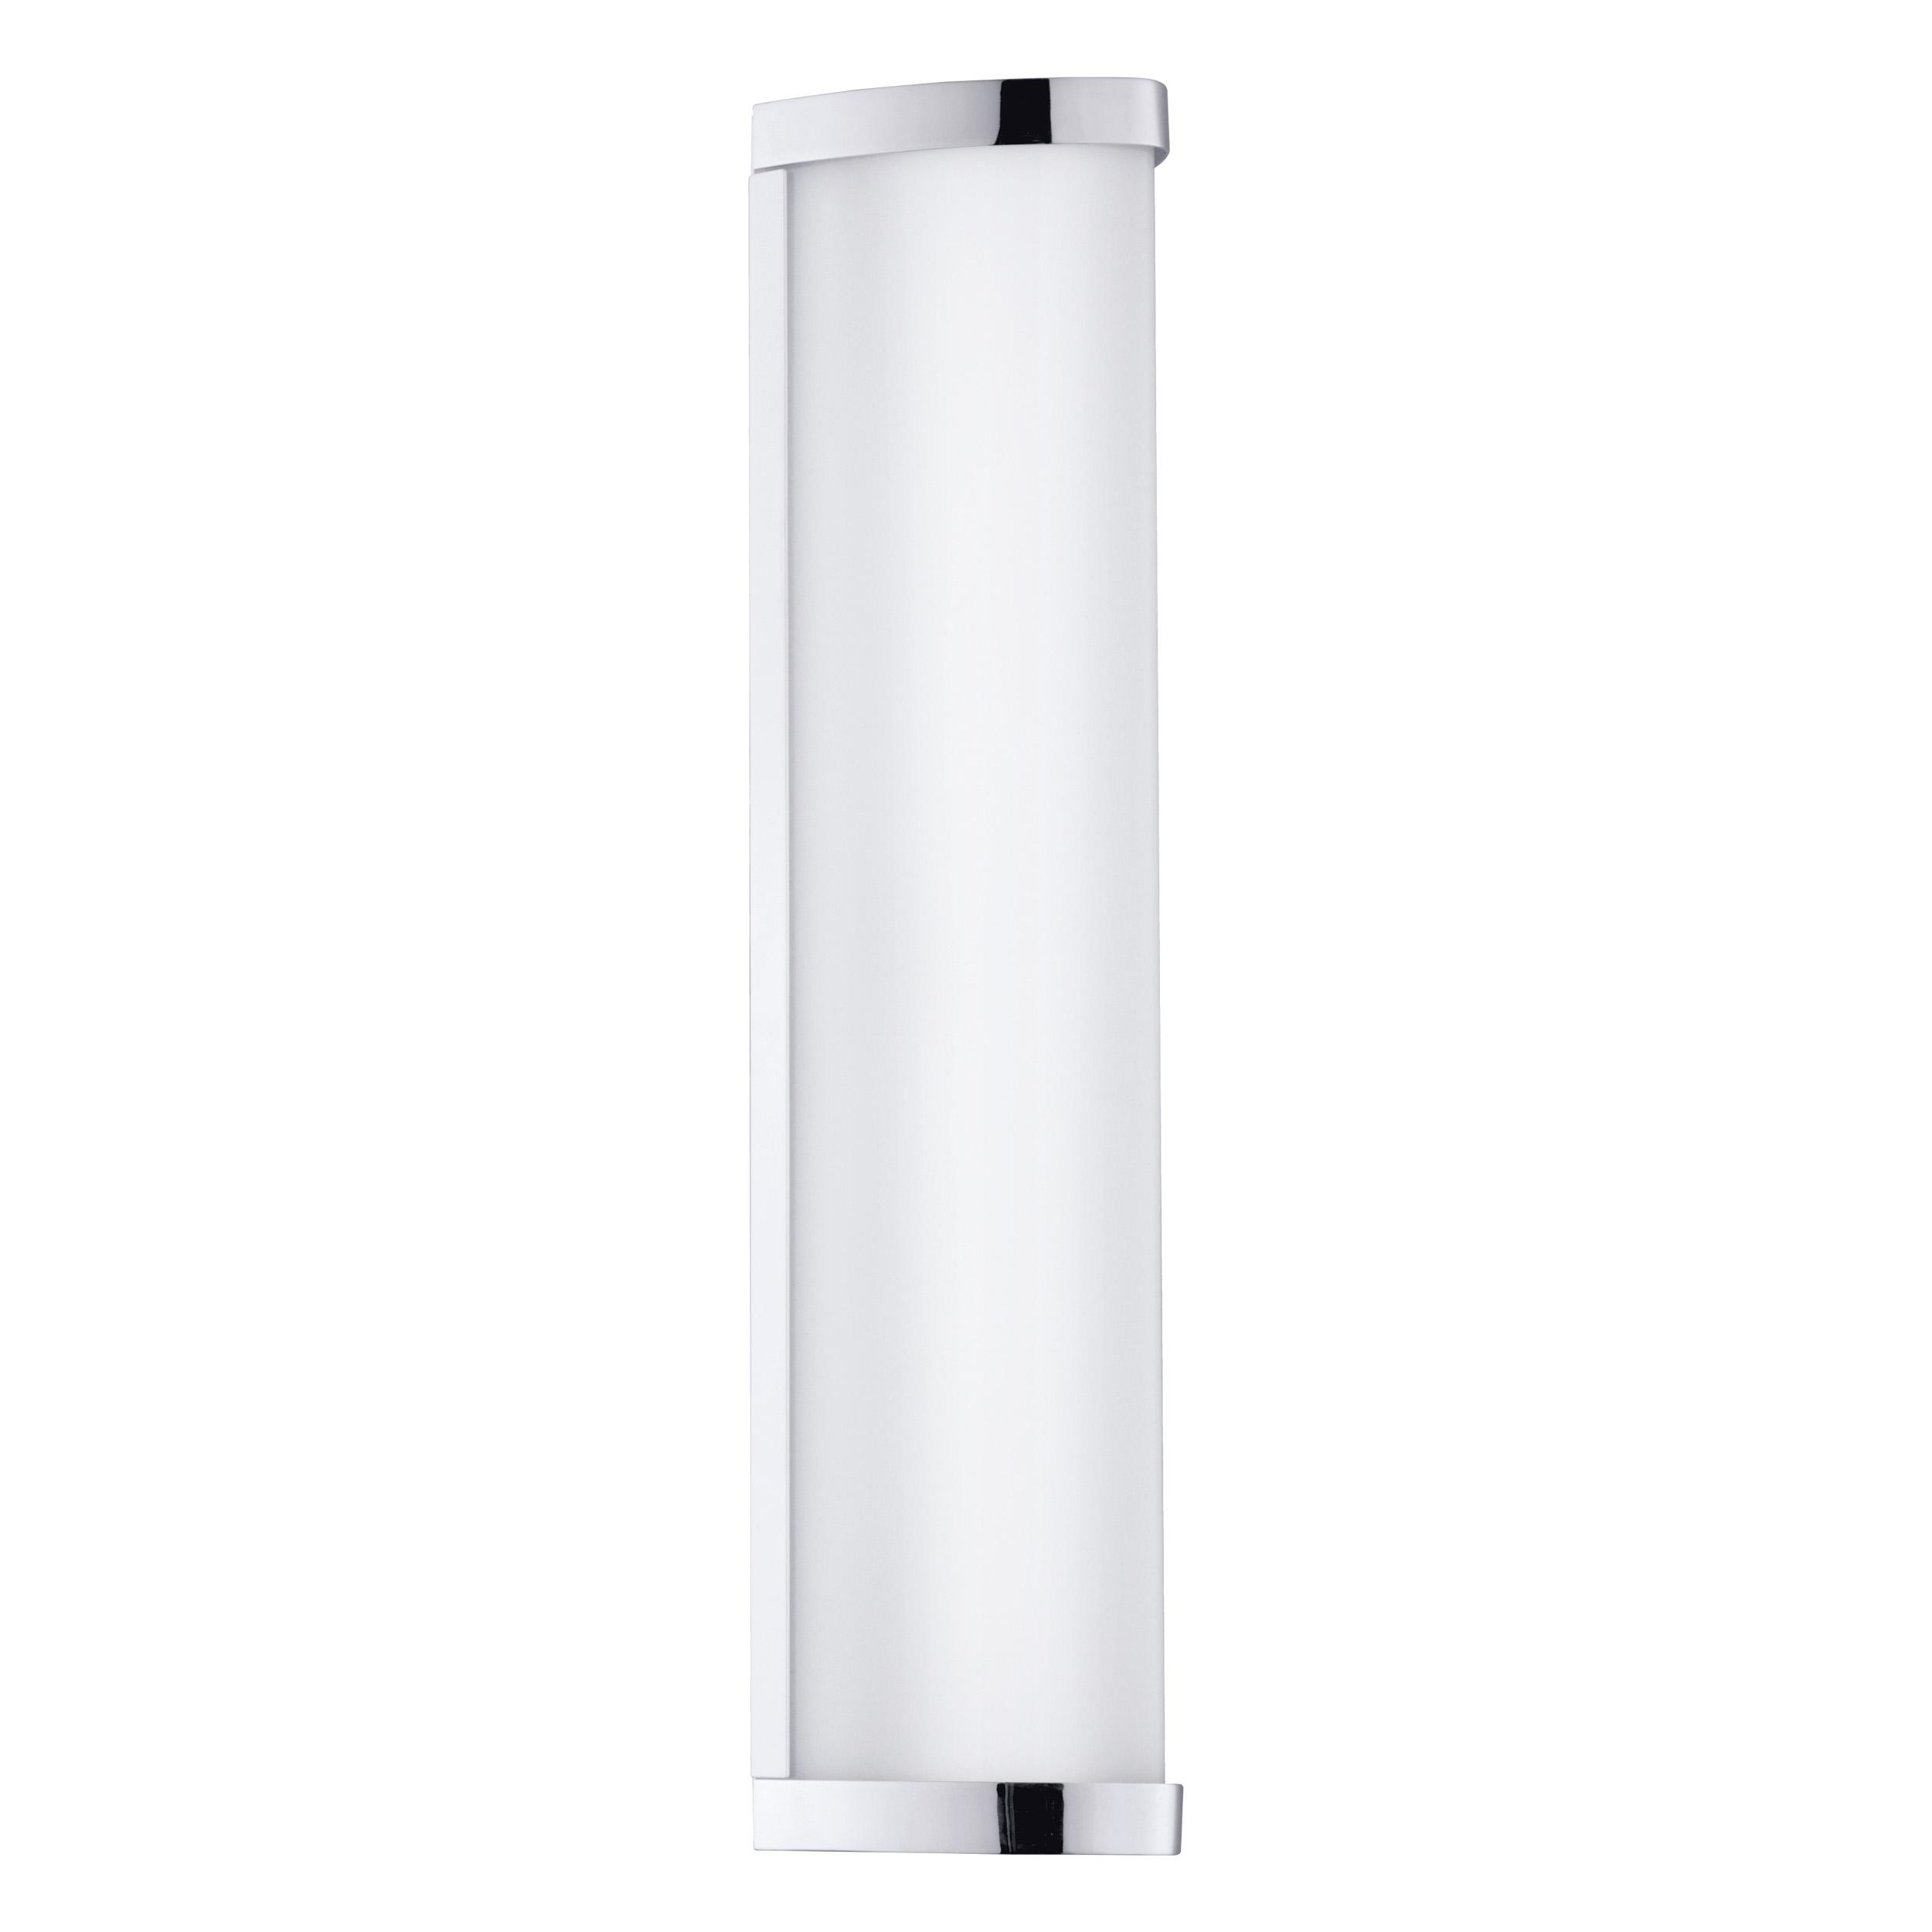 1 Stk LED-Wandleuchte Gita 2 Pro 16W 3000K chrom/weiss IP20 LI64048---